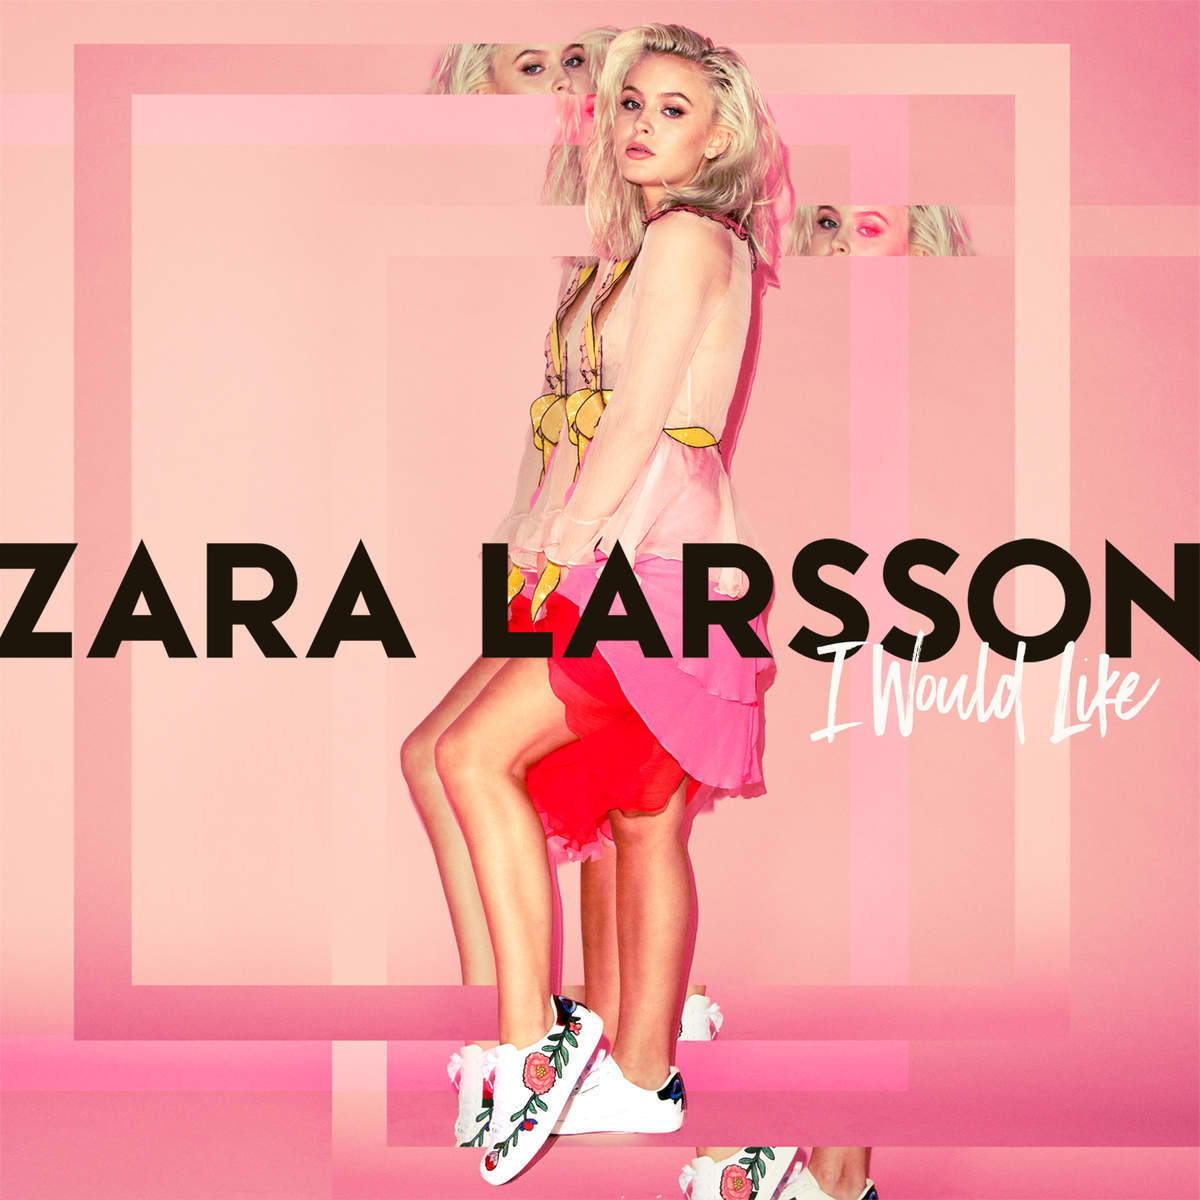 b8448a7138 ultratop.be - Zara Larsson - I Would Like